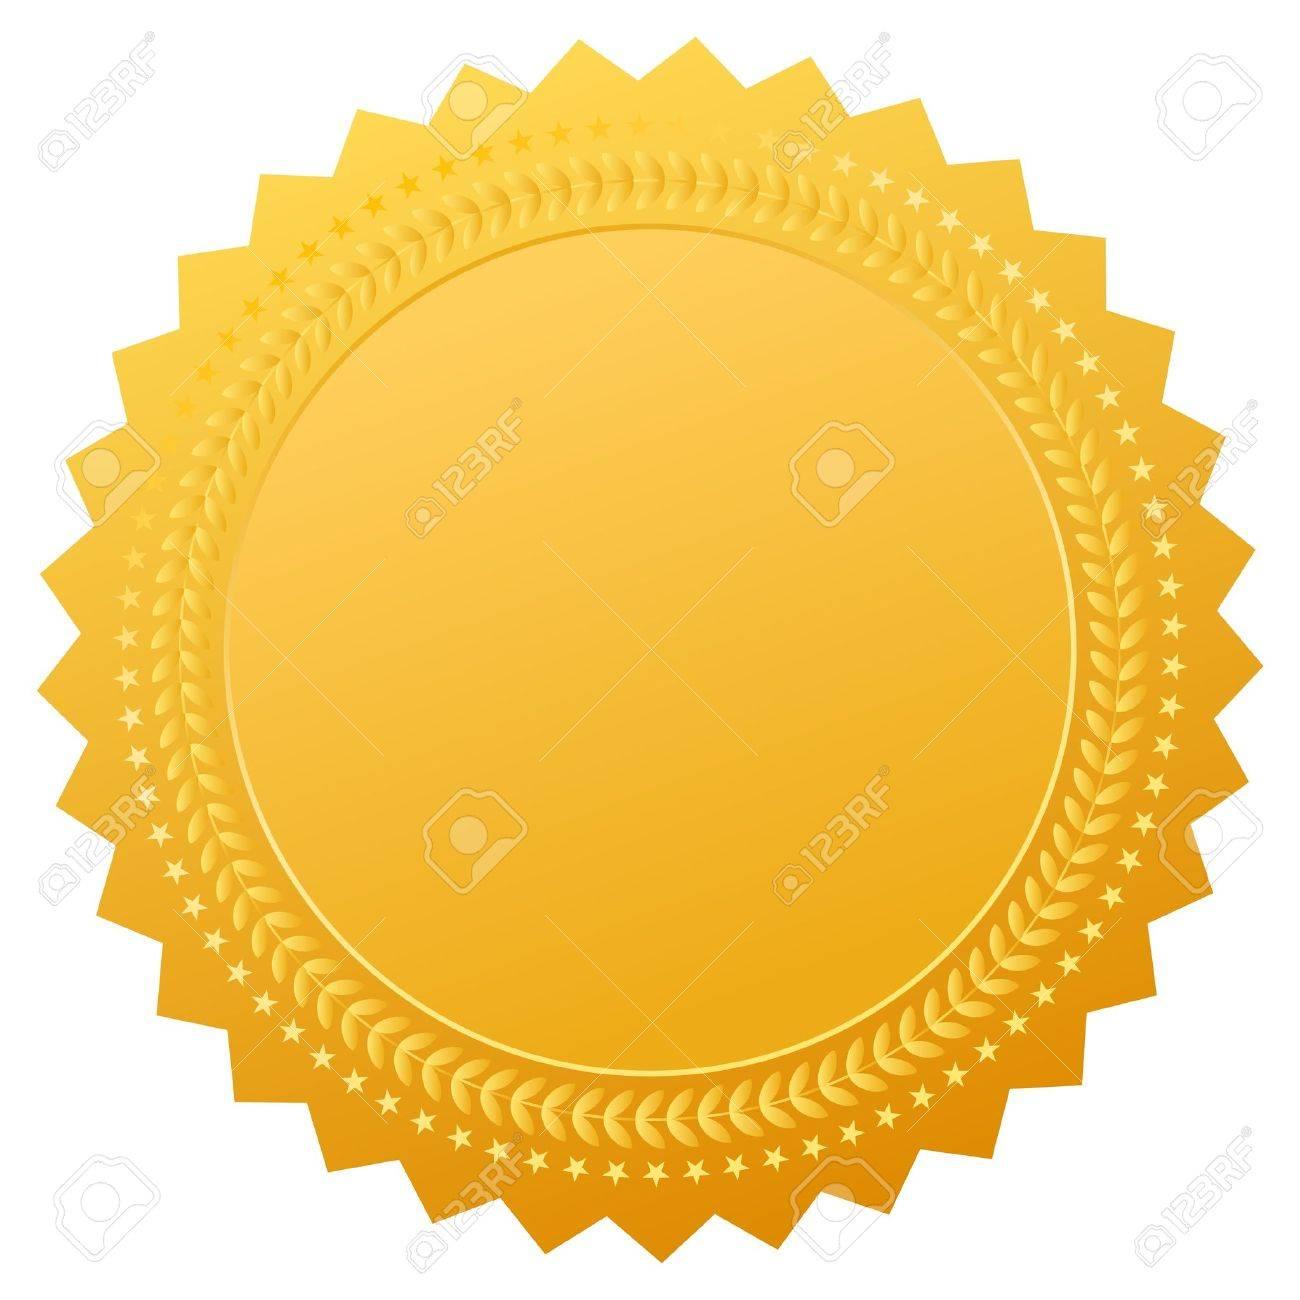 Blank gold seal, vector clip art.